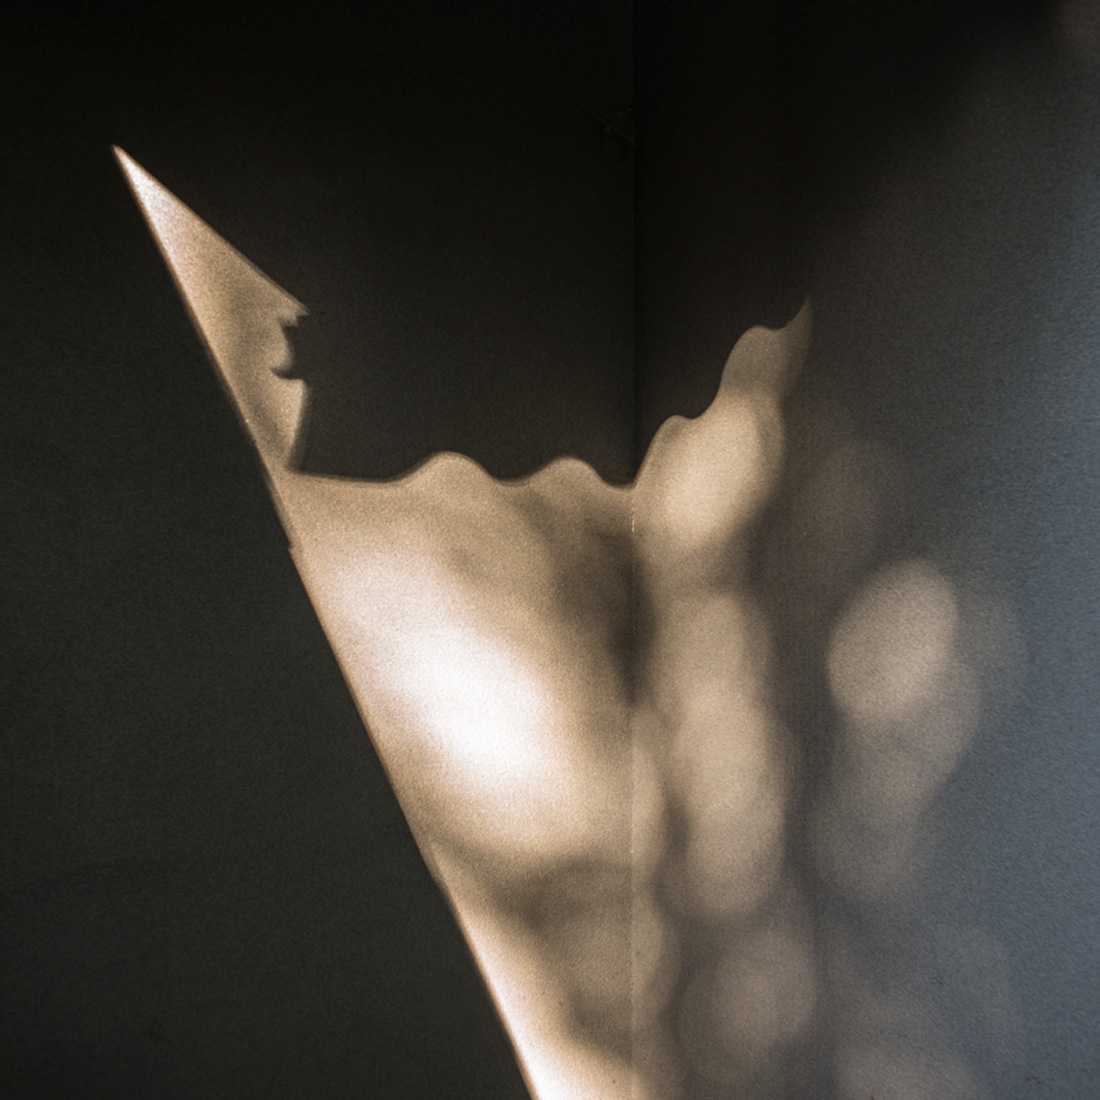 estudio 5391. Opole. 2015 - detrás del reflejo.-behind the reflection- - senén merino, photograph